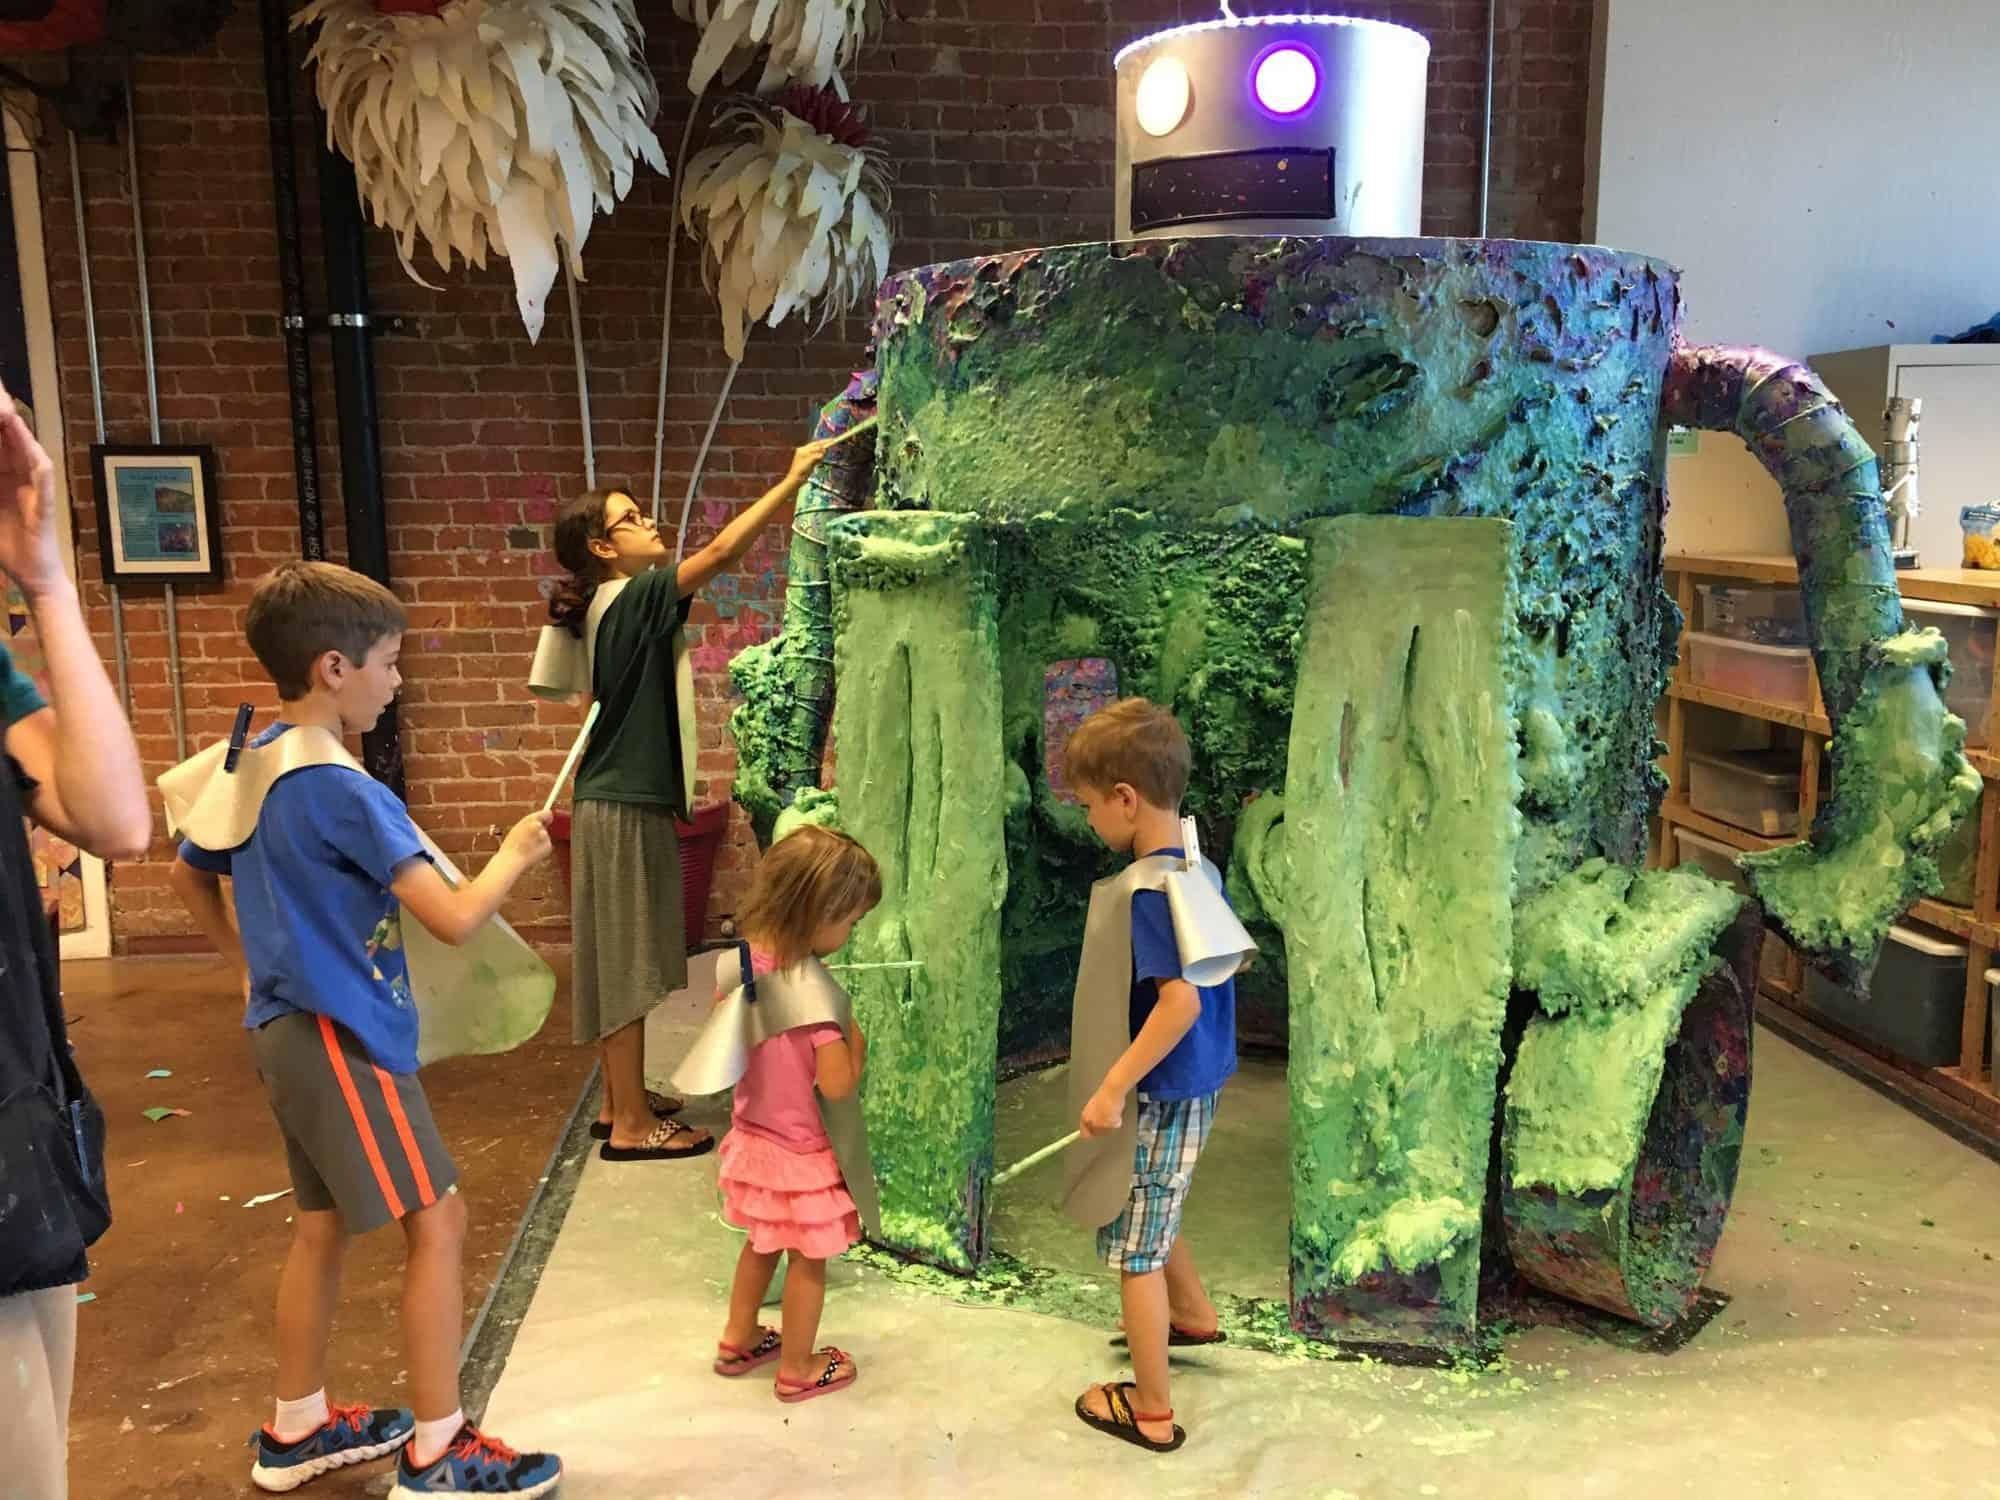 Top 10 Things To Do In Phoenix With Kids Trekaroo Blog